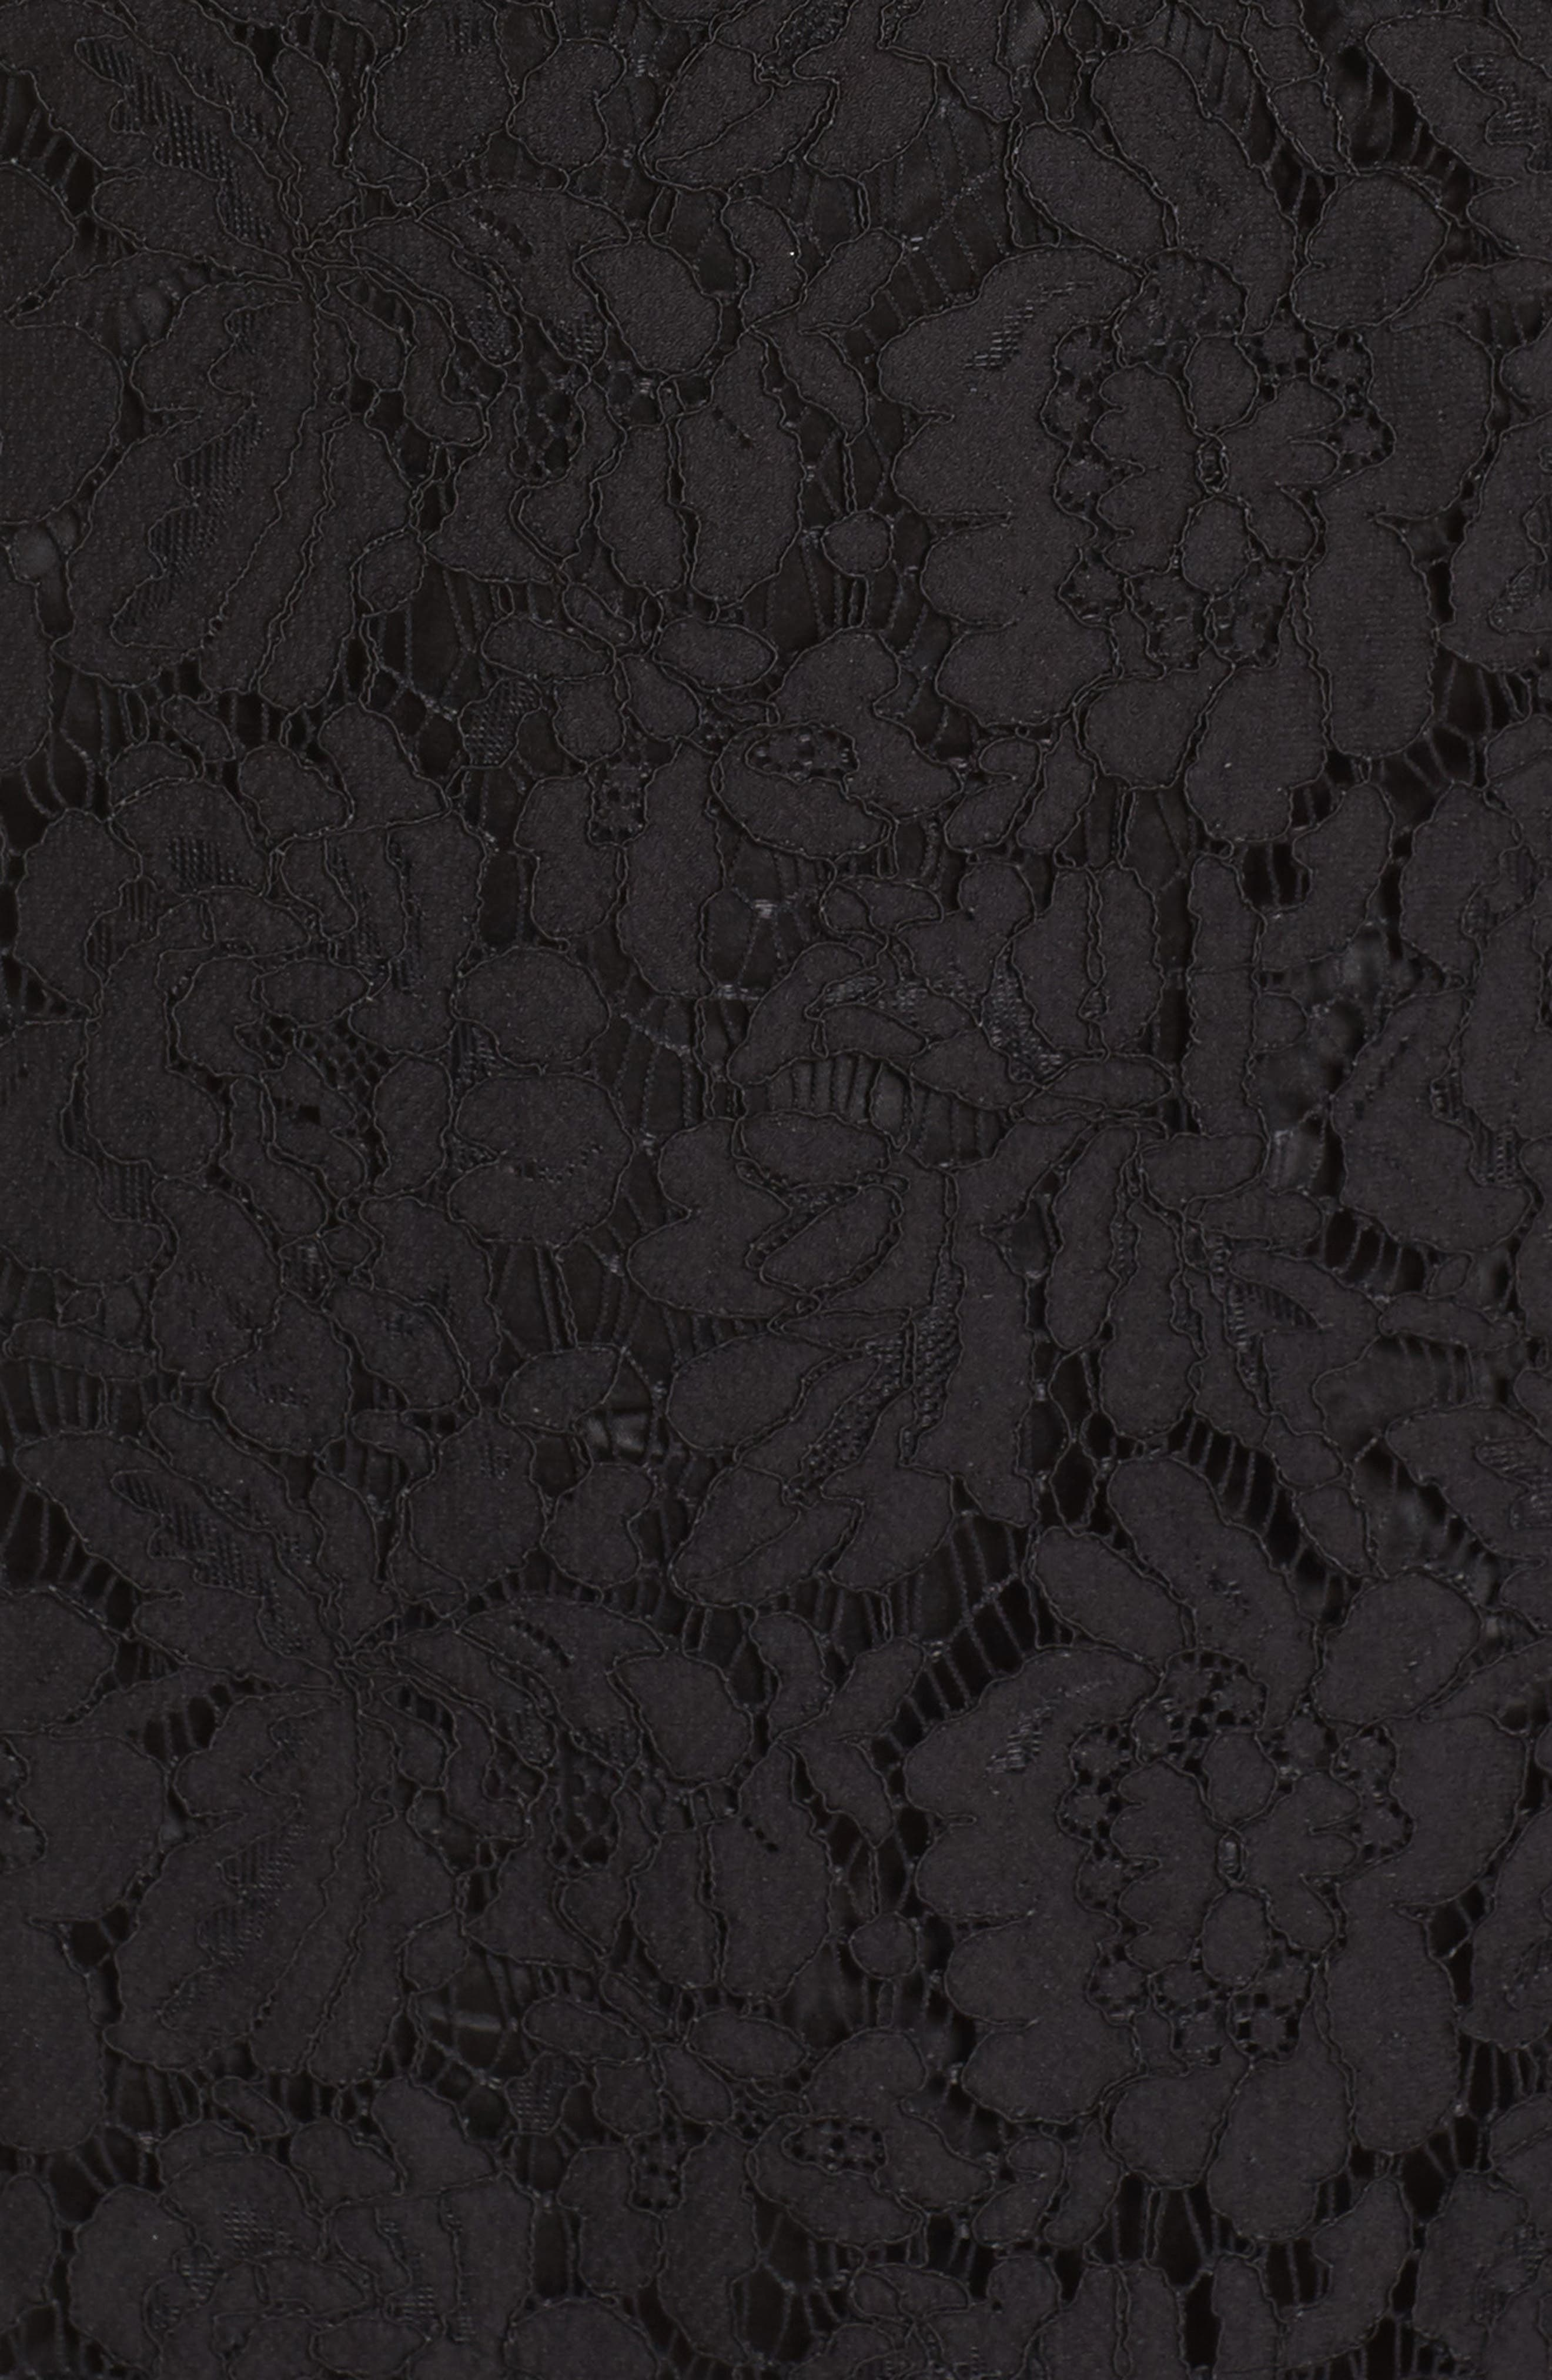 Lace Fit & Flare Cocktail Dress,                             Alternate thumbnail 7, color,                             BLACK